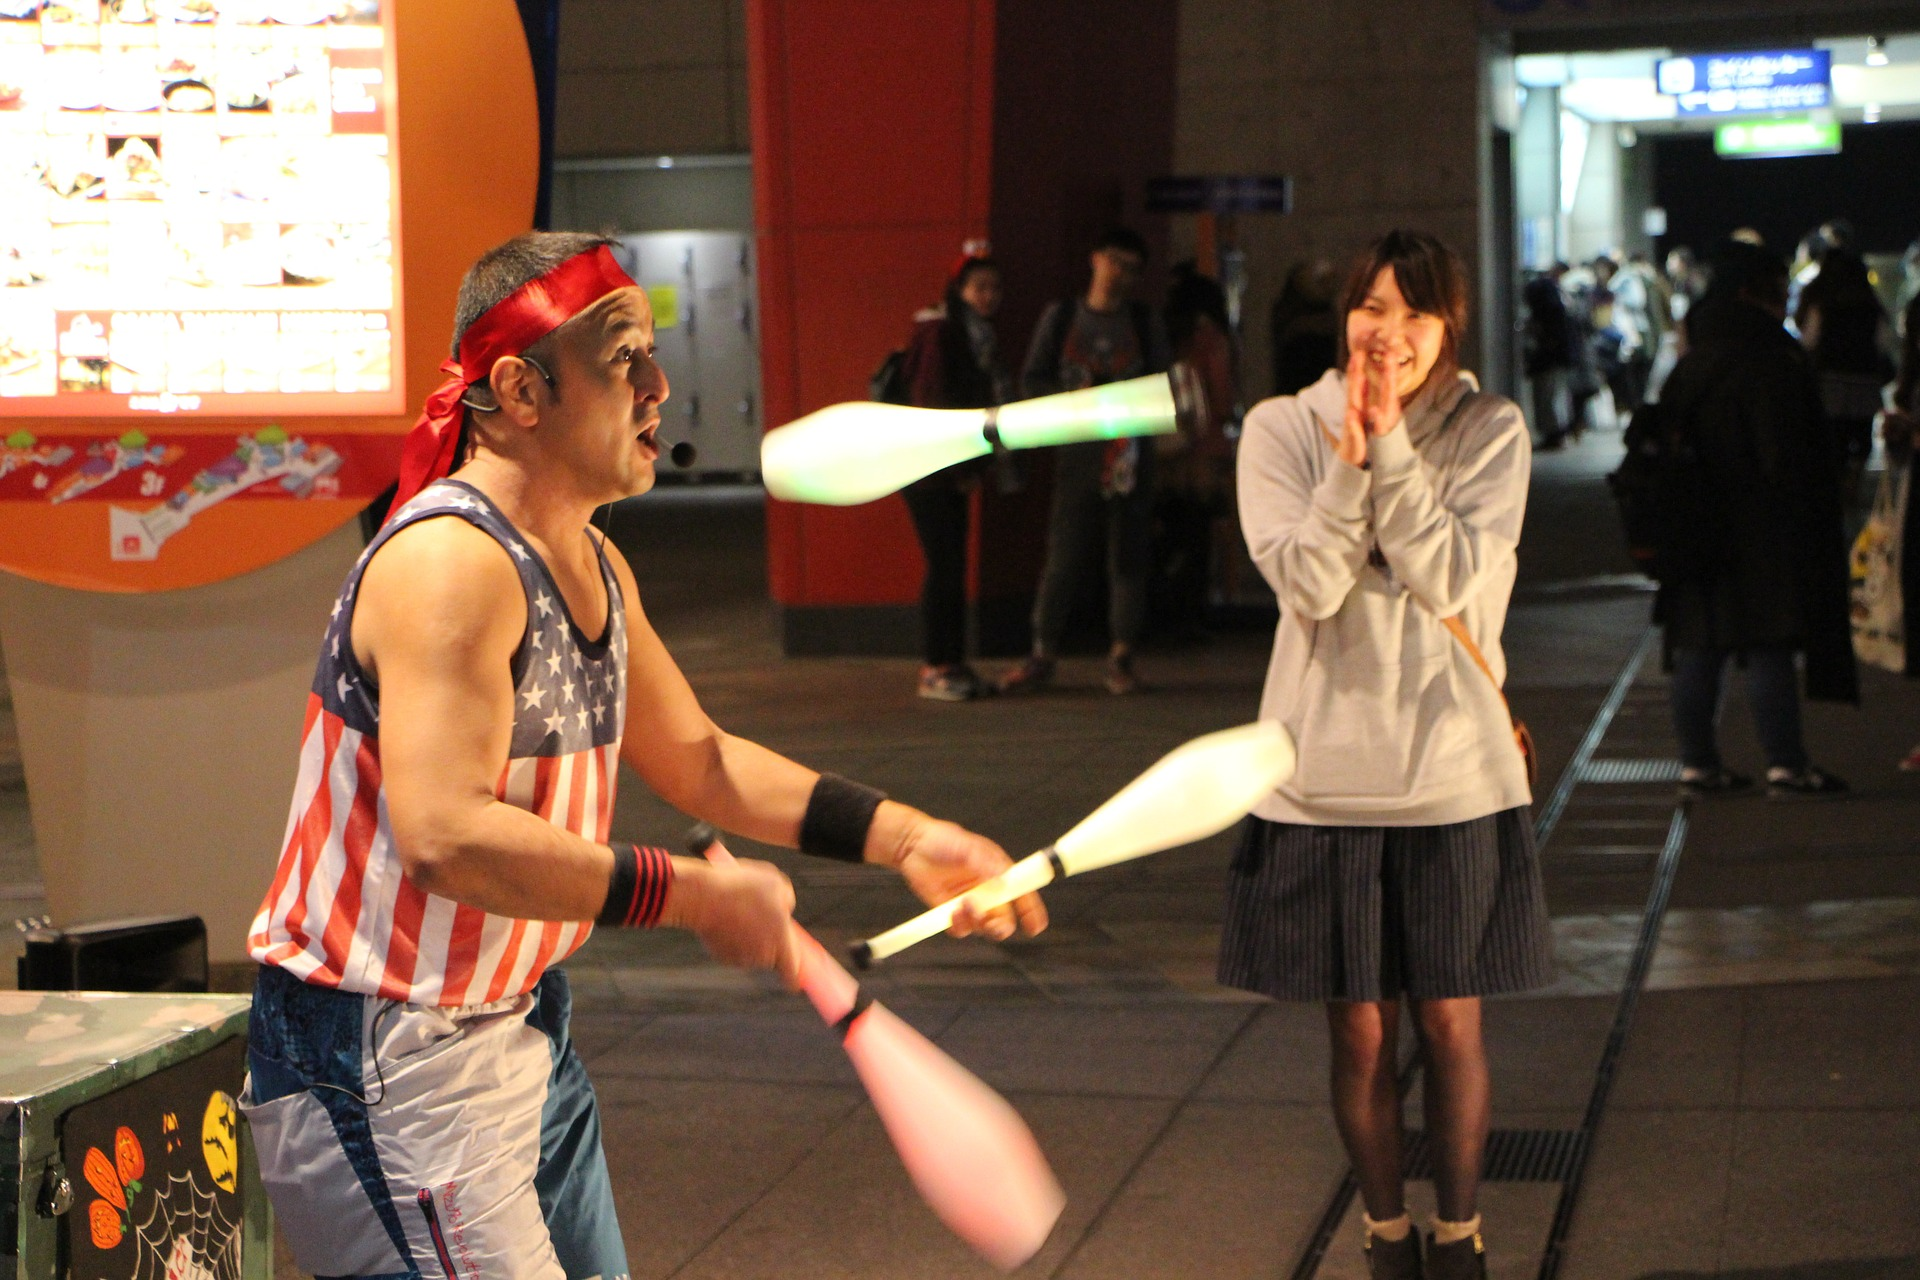 juggling-1176426_1920.jpg